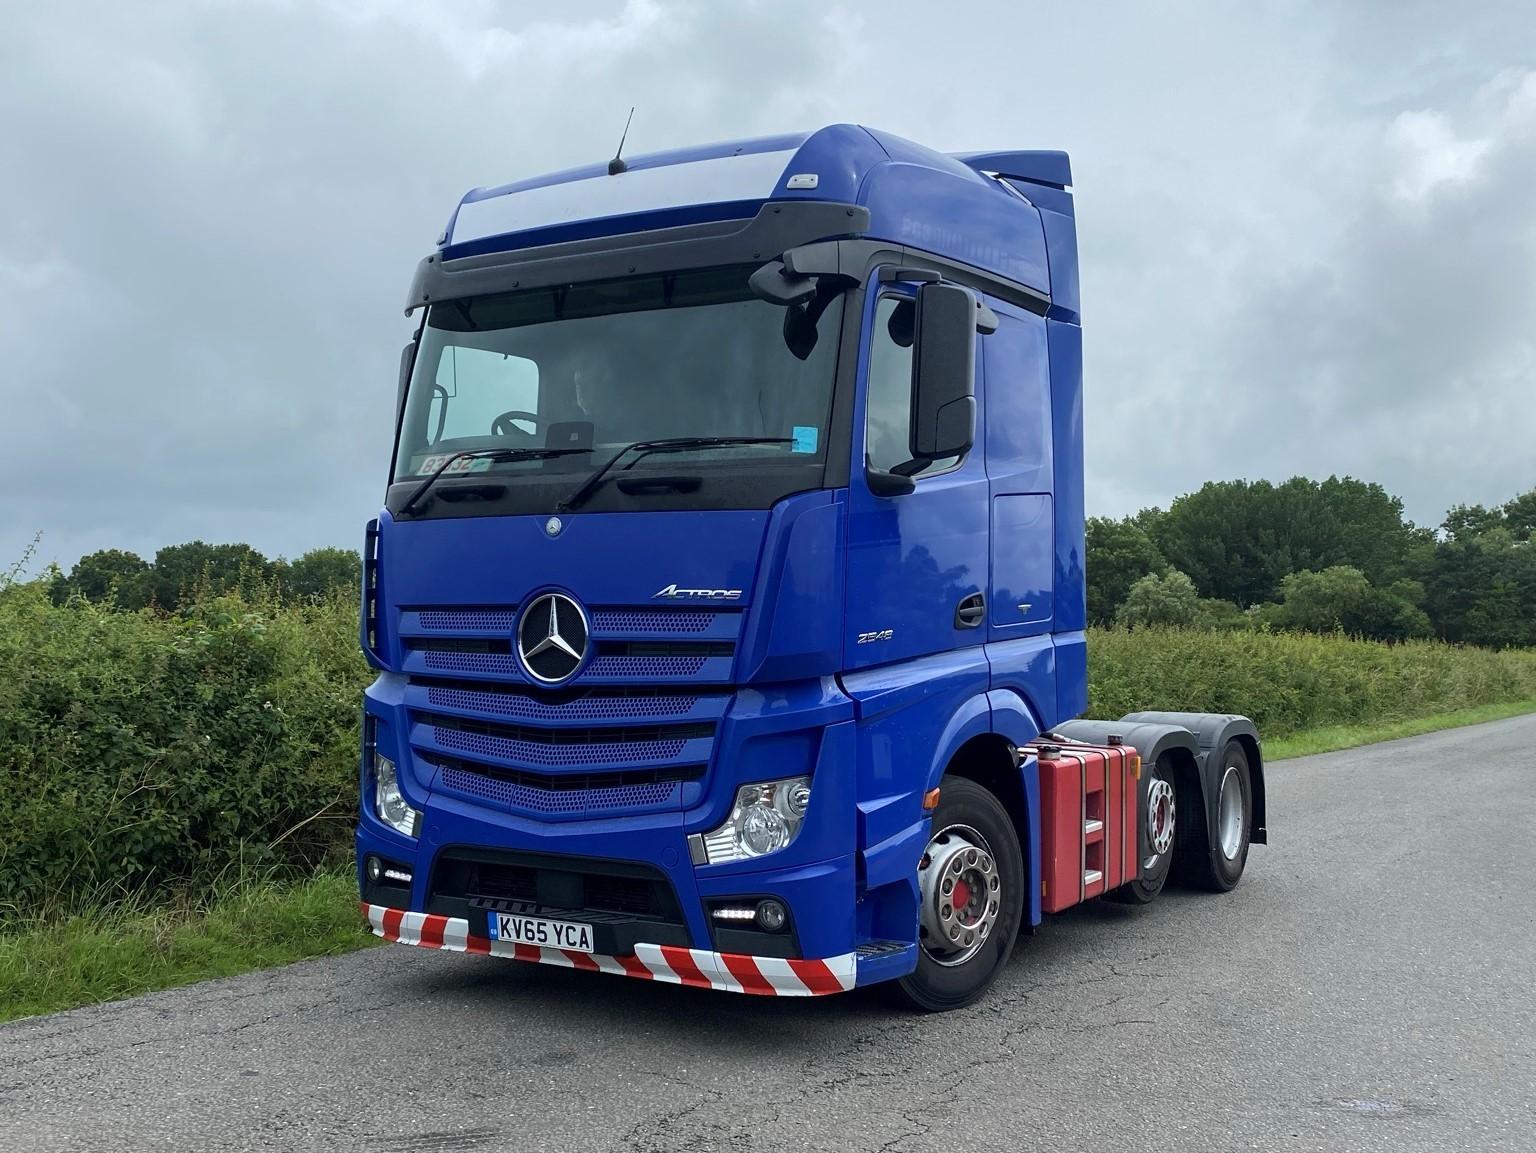 Mercedes Benz Actros 2548 6 X 2 Tractor Unit